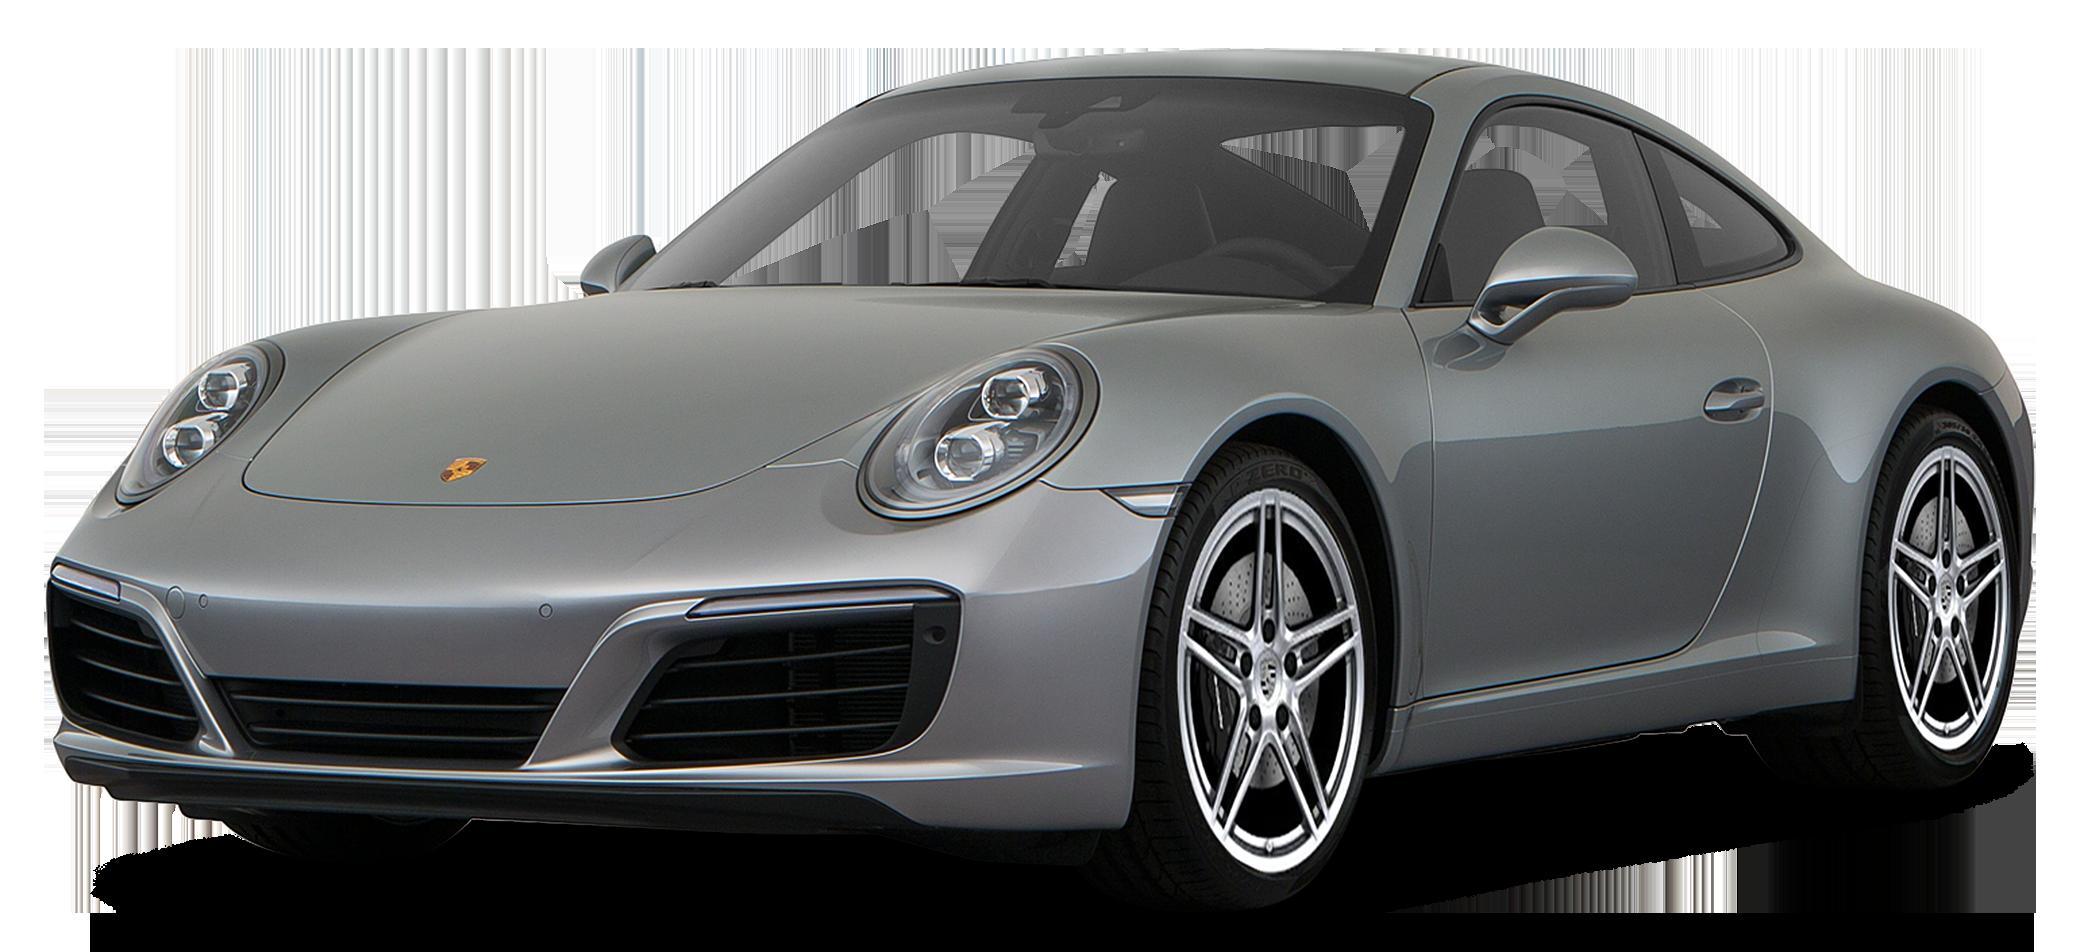 Herb Chambers Porsche >> 2019 Porsche 911 Incentives, Specials & Offers in Burlington MA